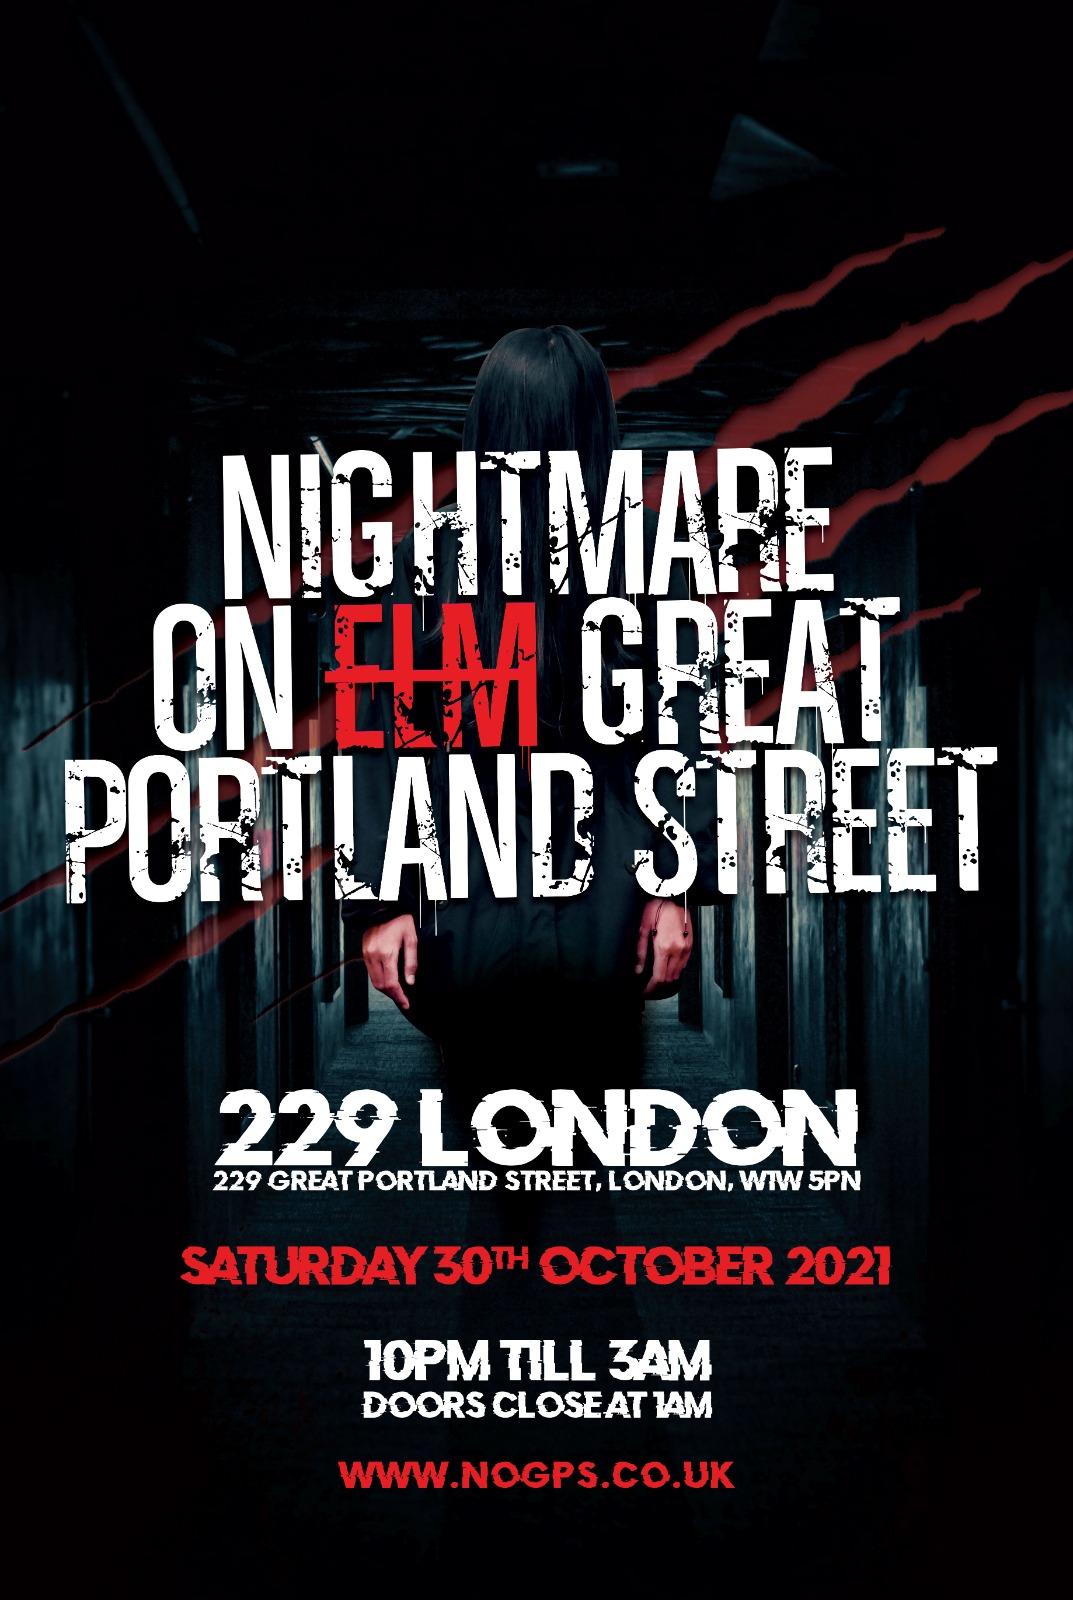 Nightmare On Great Portland Street